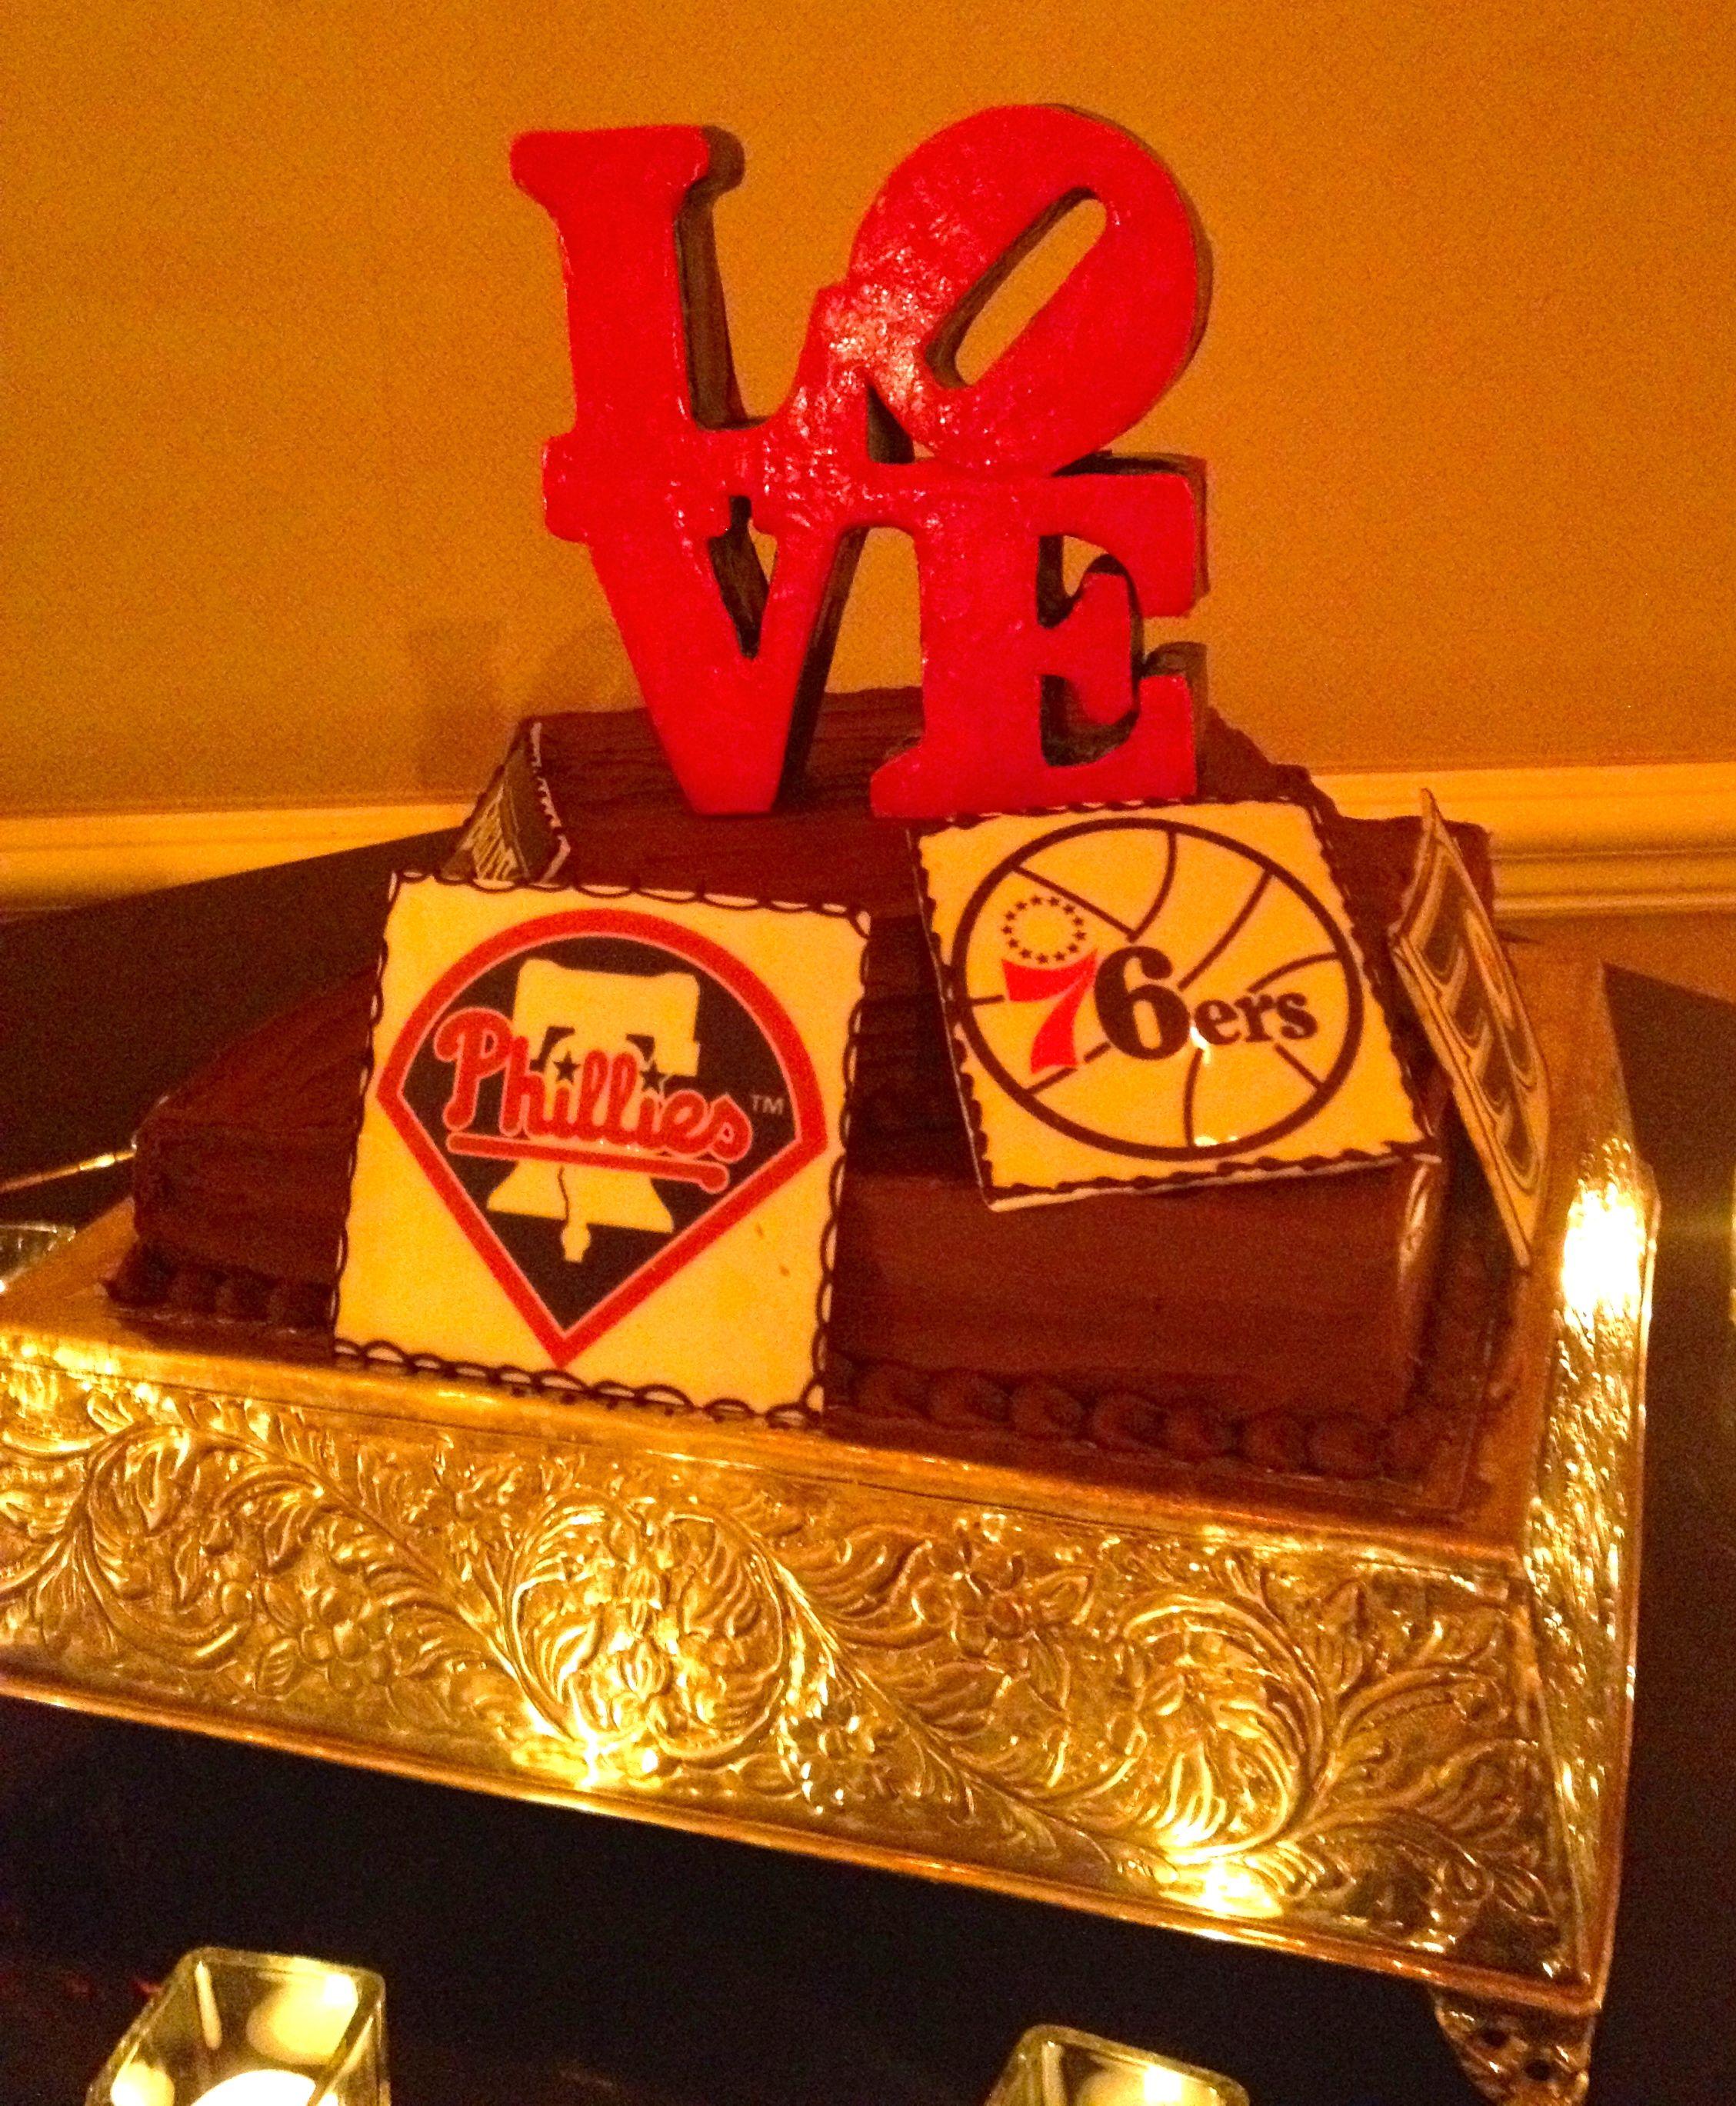 39+ Best wedding cakes in austin ideas in 2021